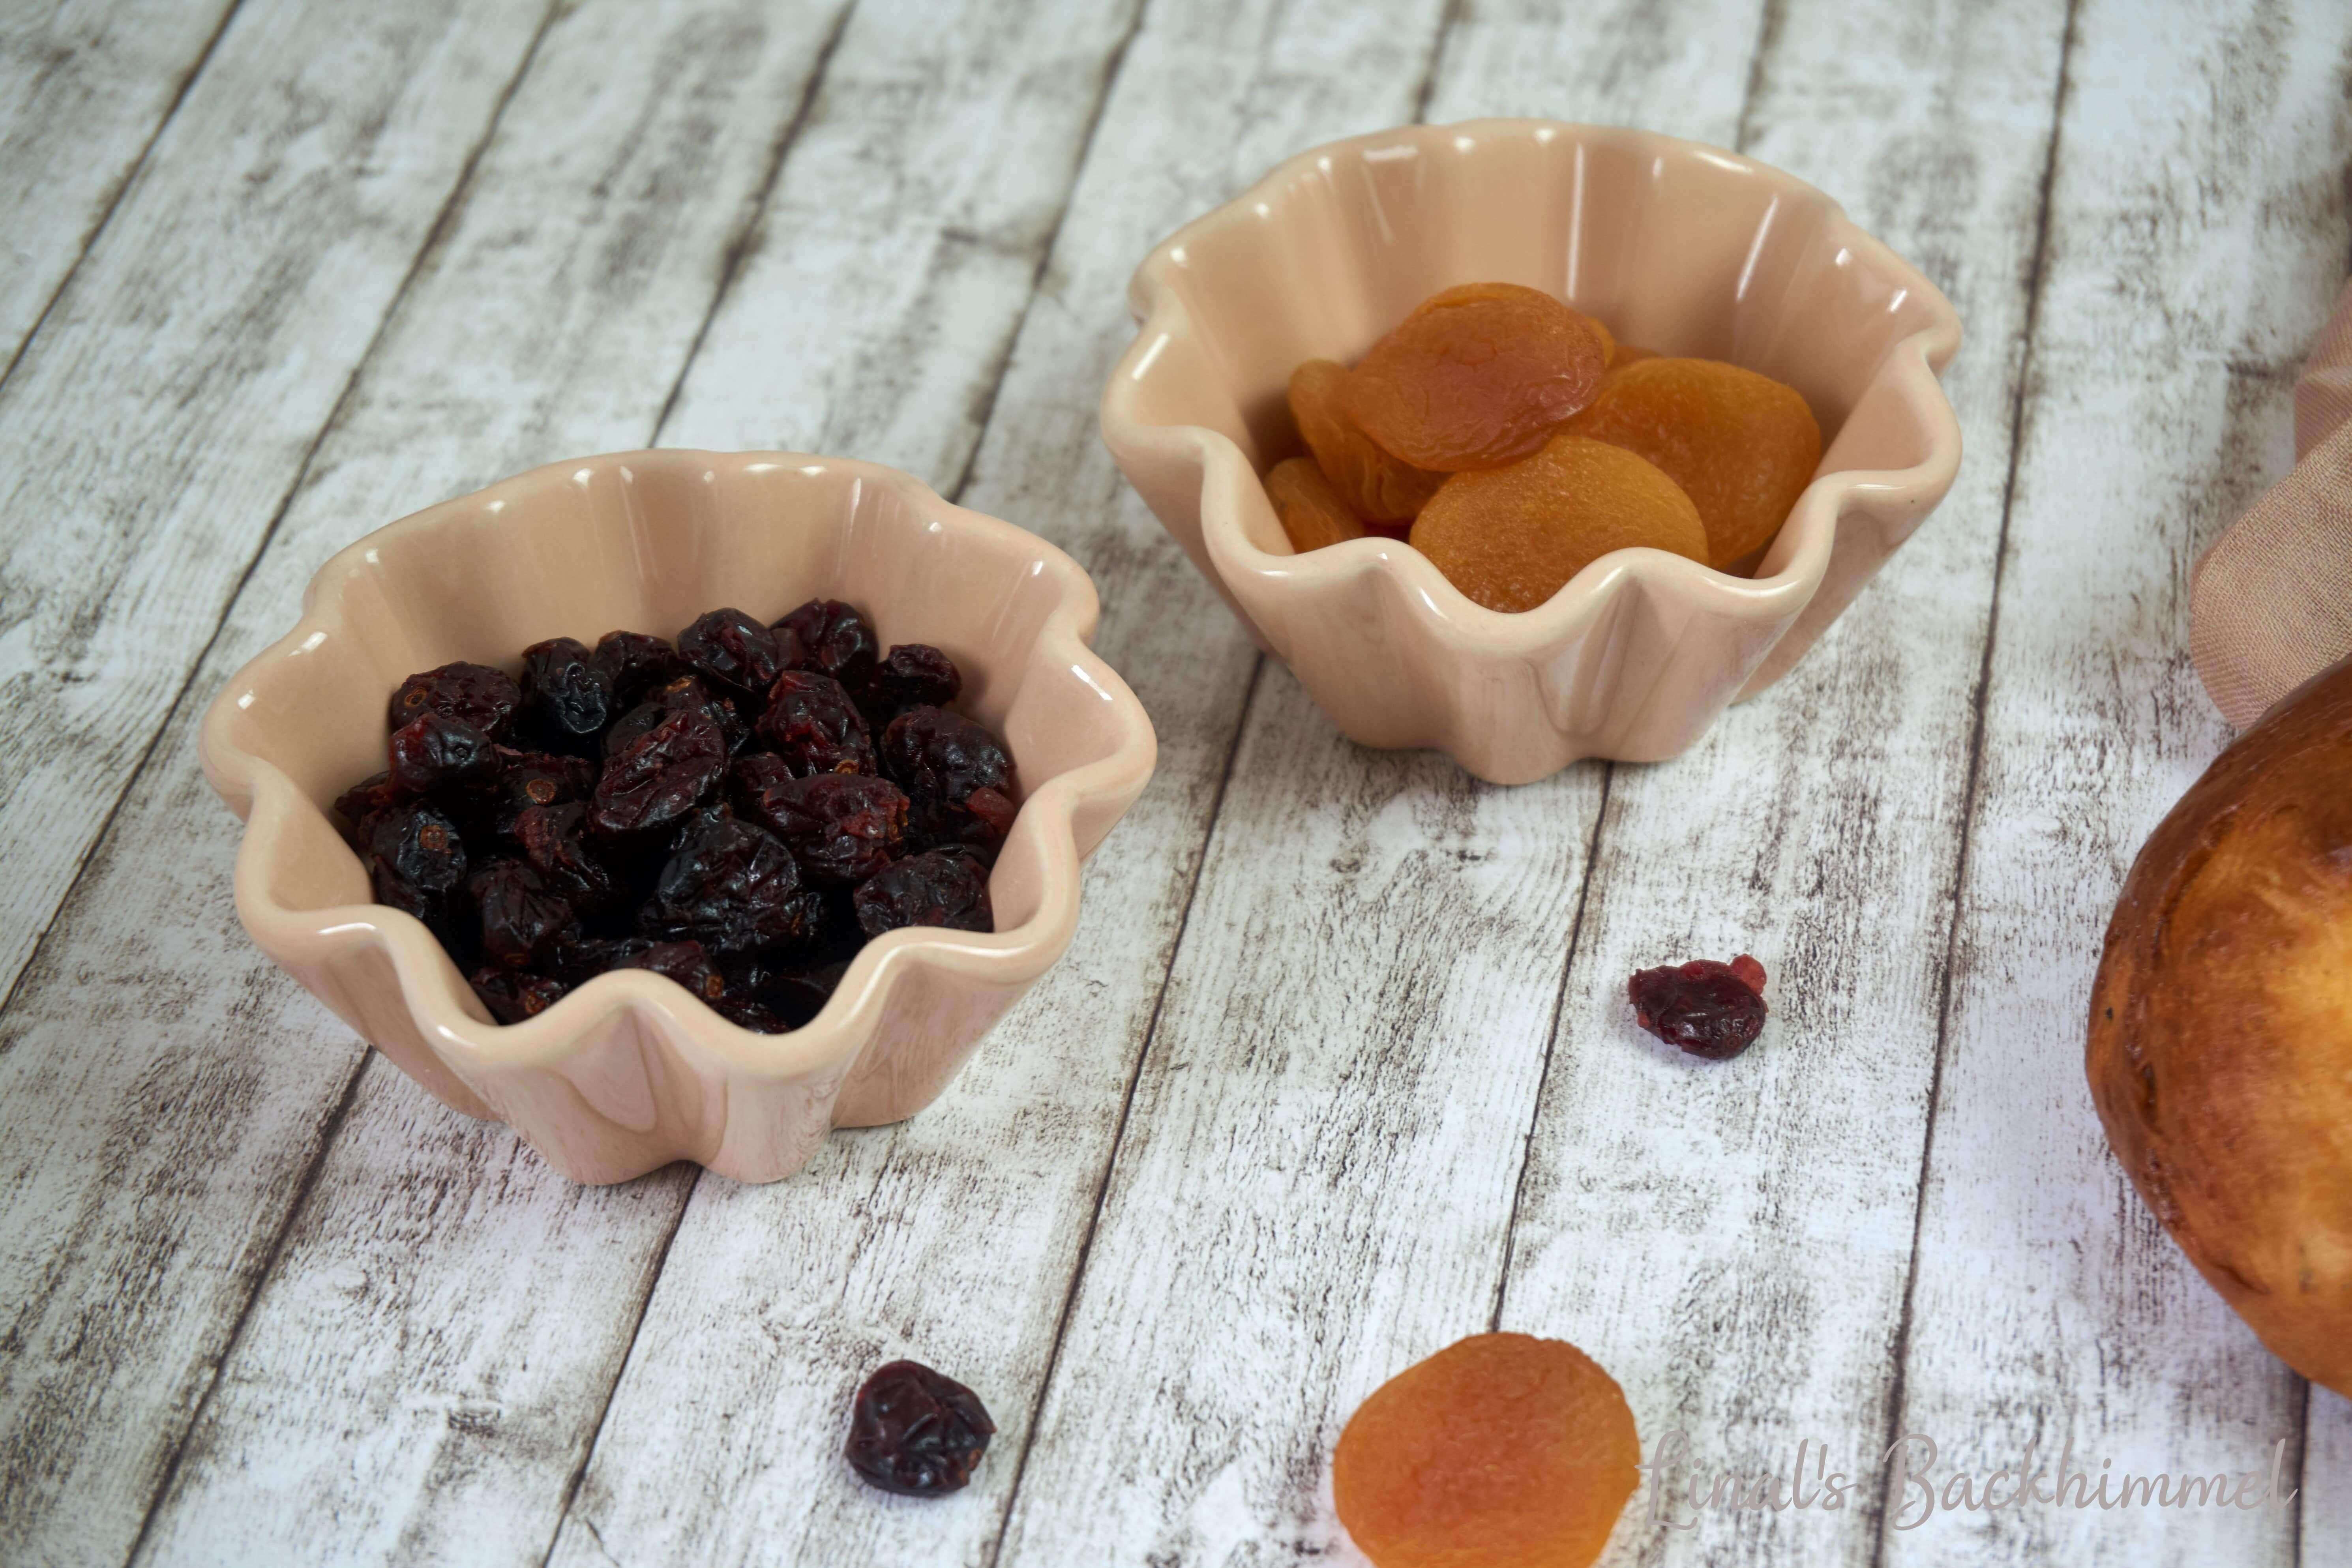 Cranberry-Aprikosen-Zopf - Hefewoche